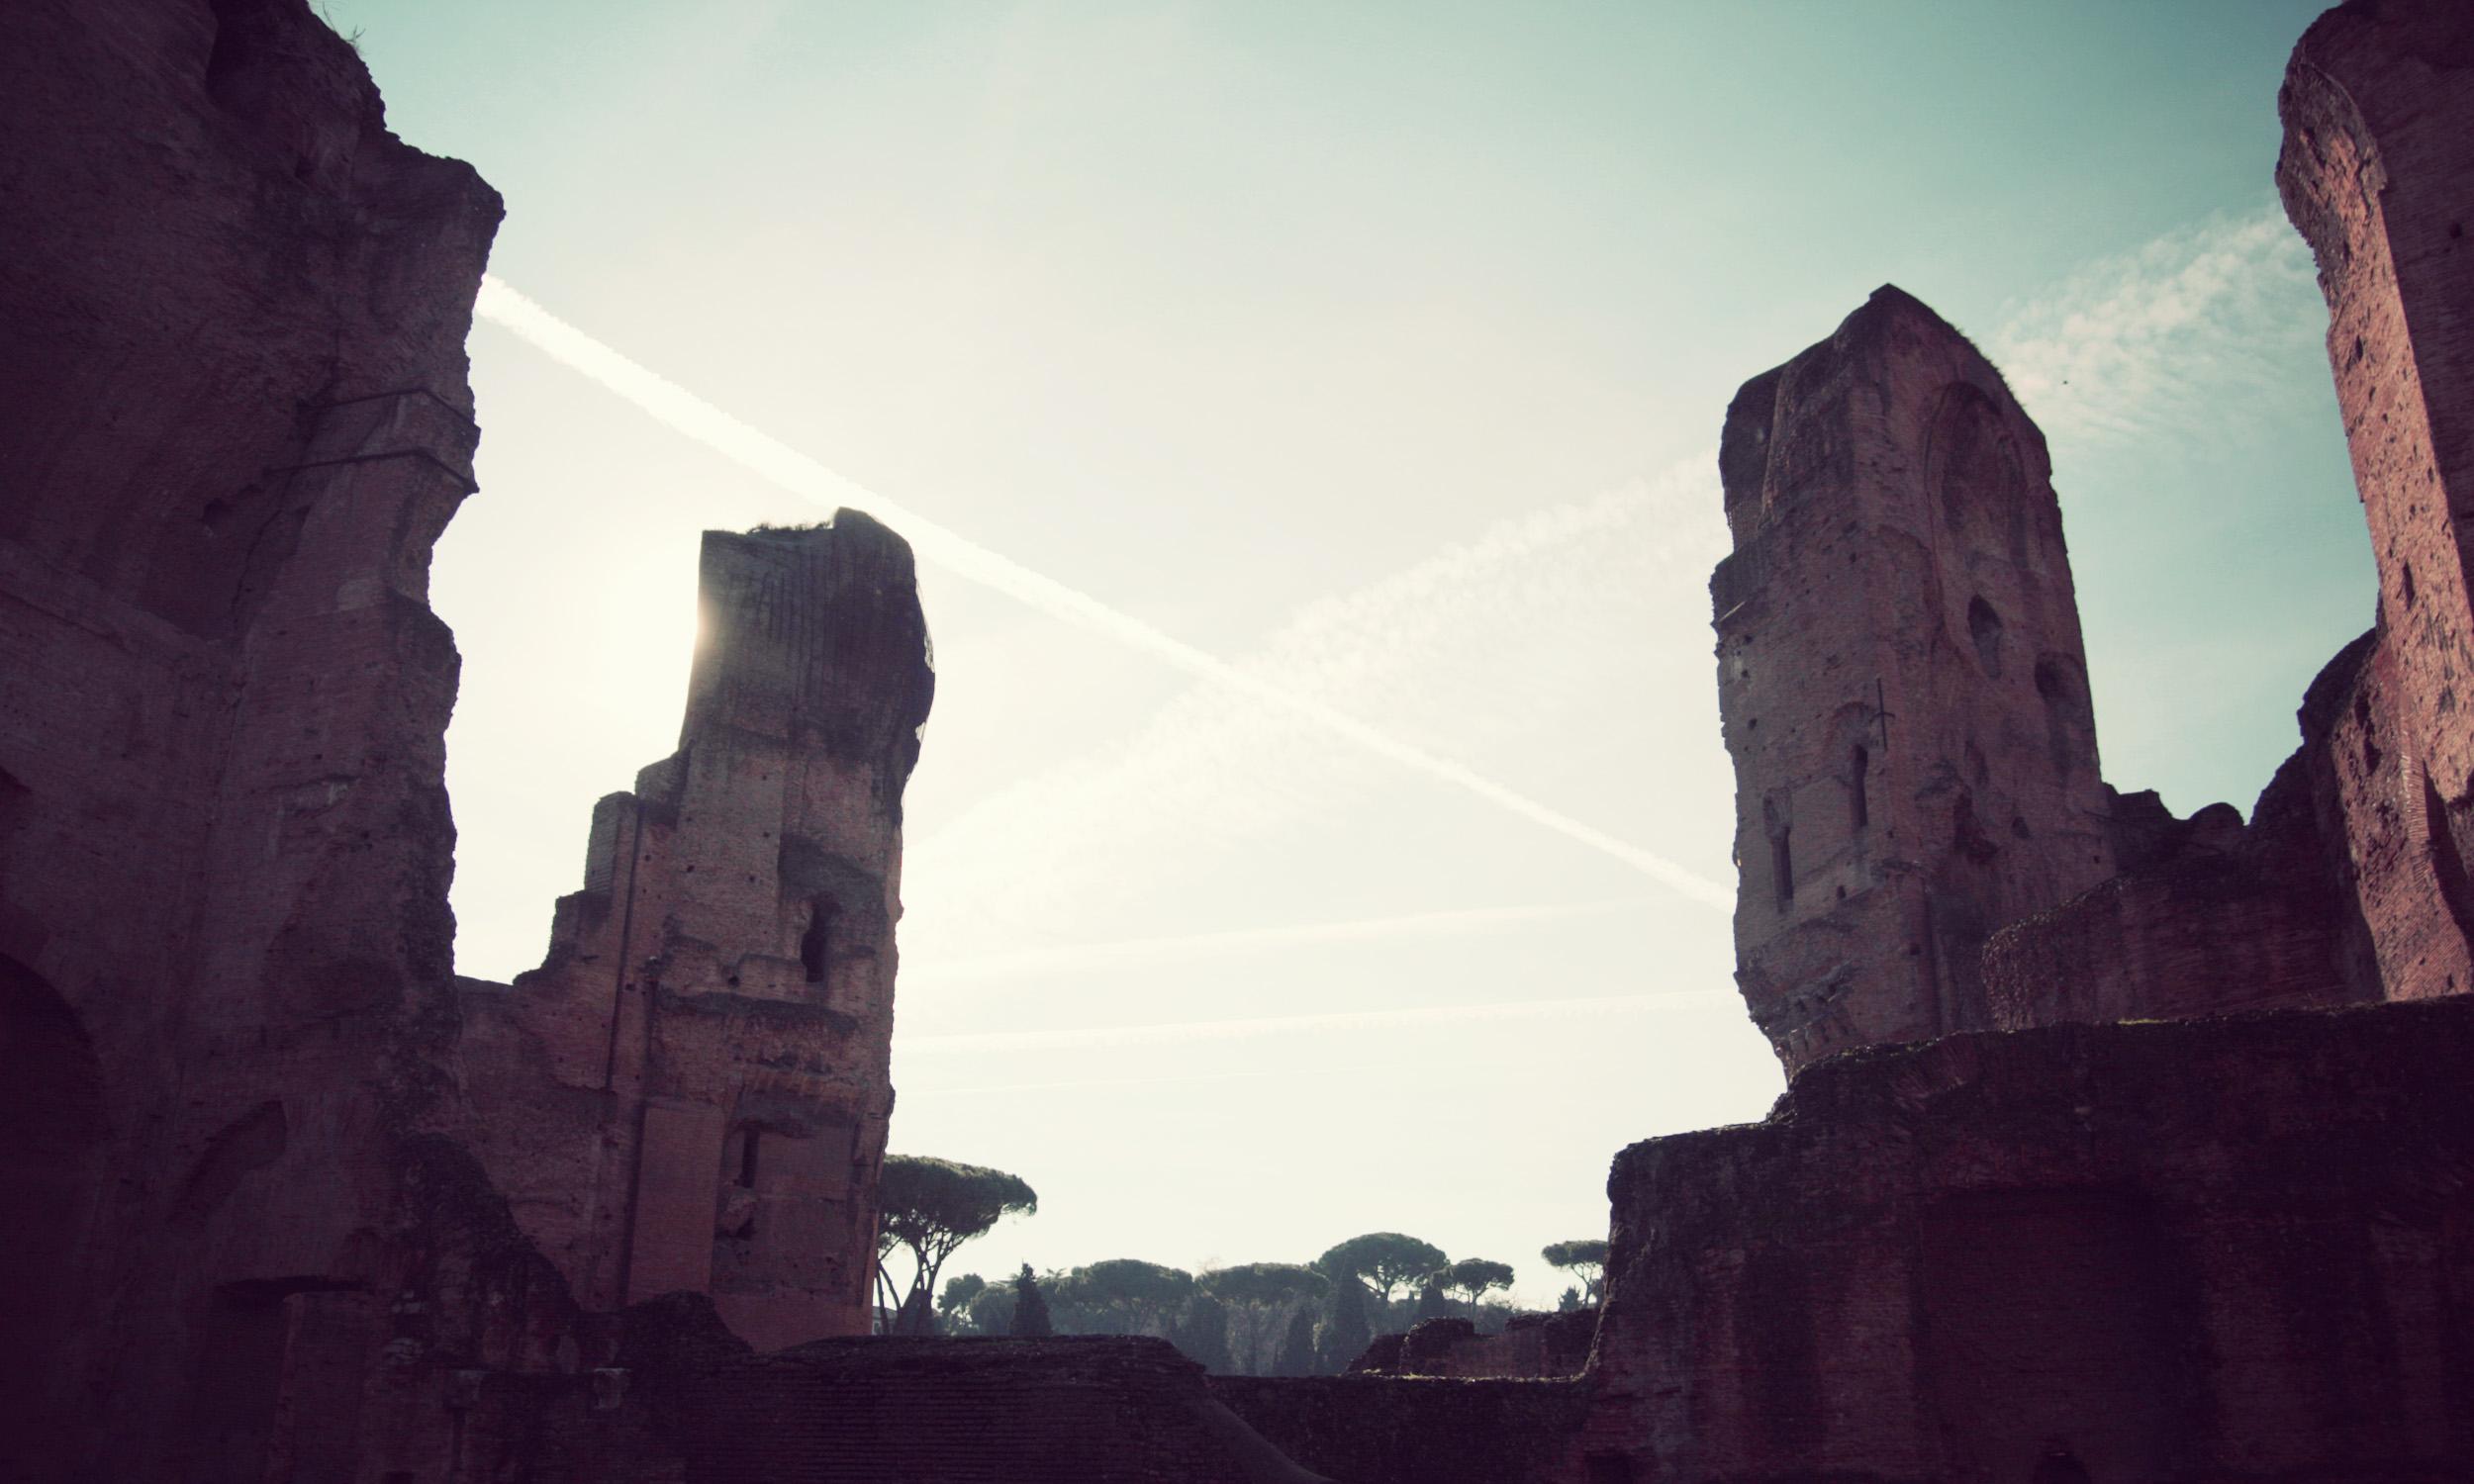 Baths-of-Caracalla_08.jpg